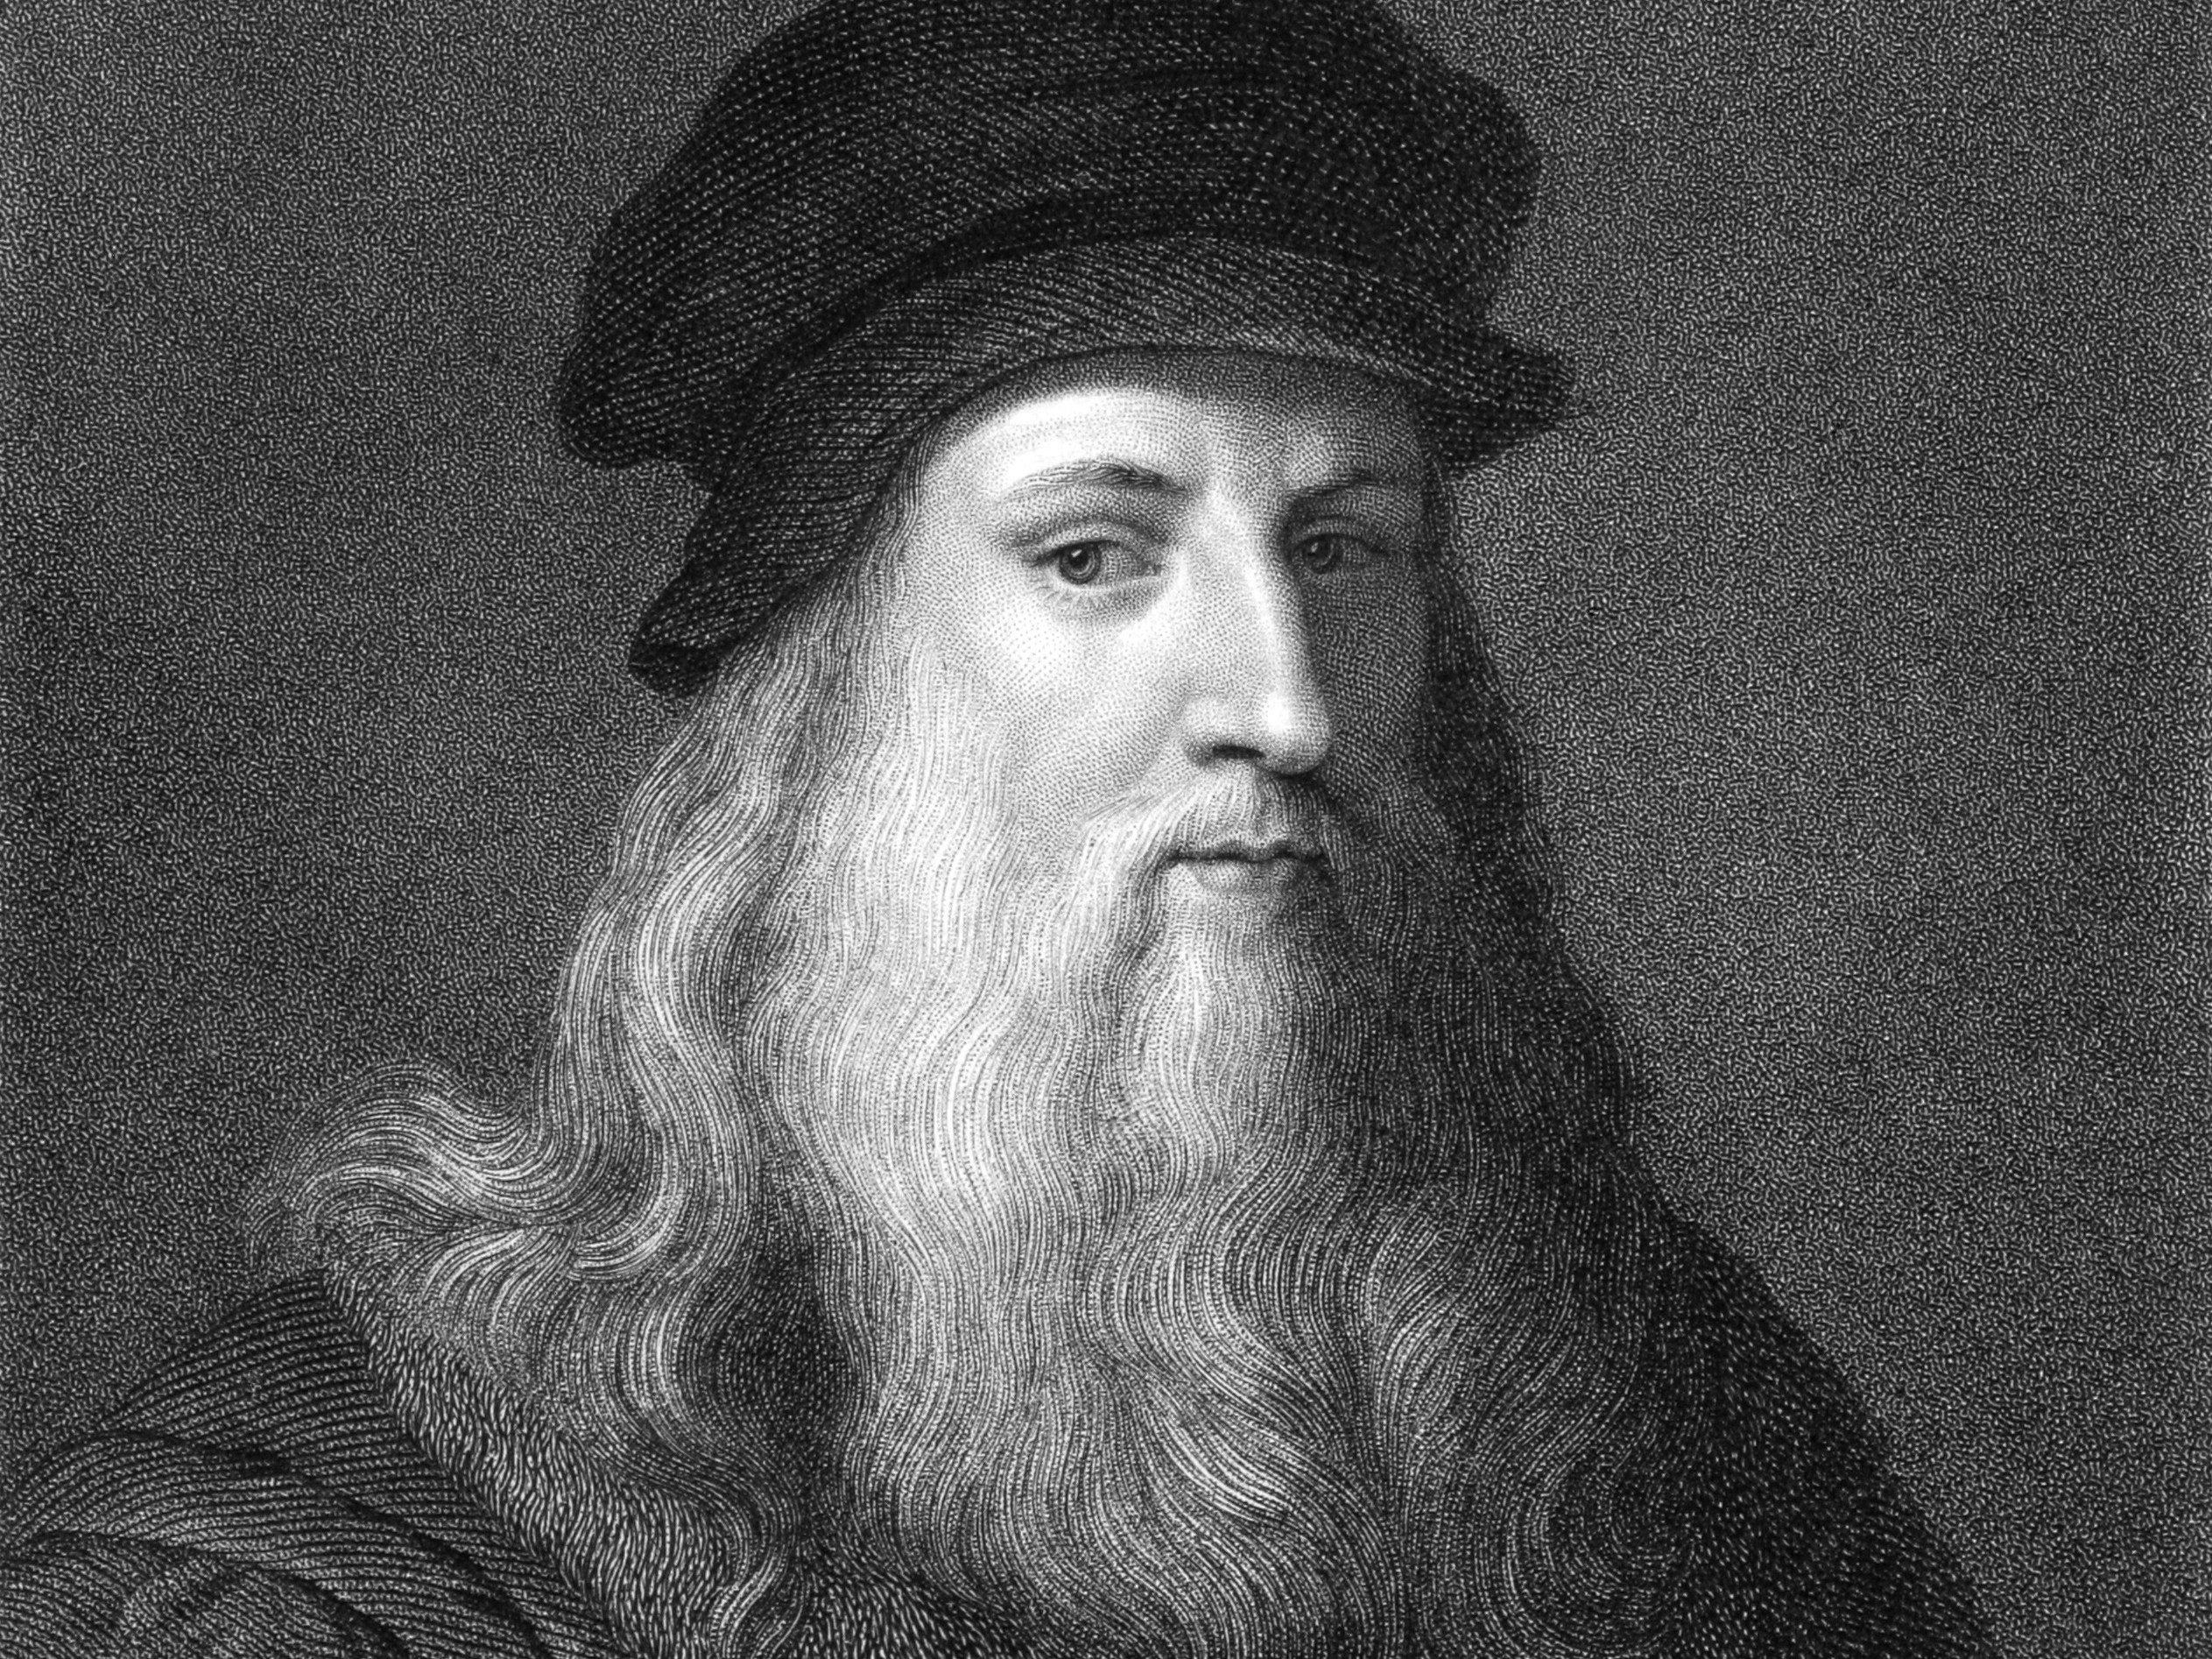 Mona Lisa mystery #6: Da Vinci's obsession